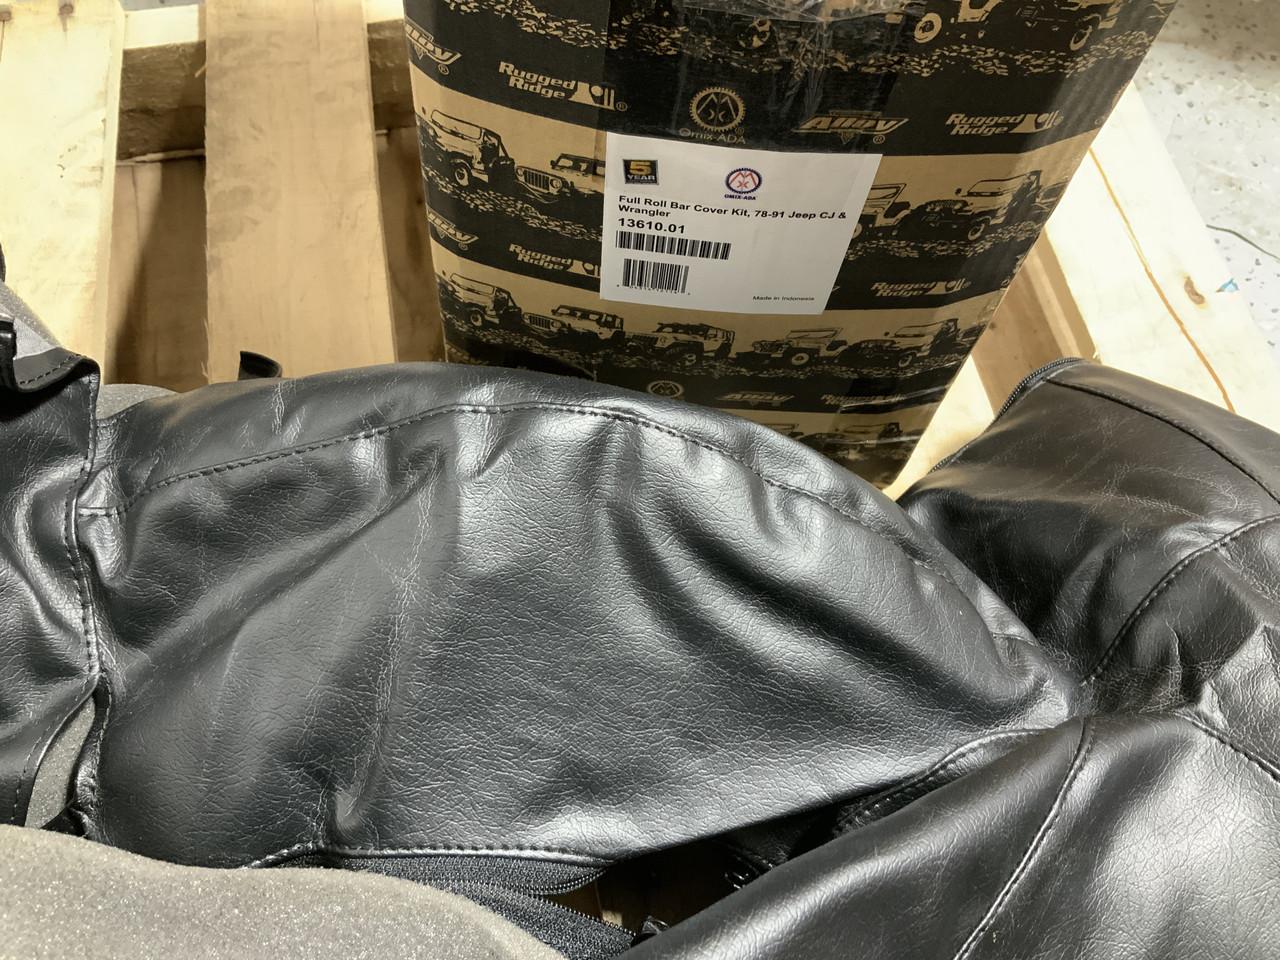 Rugged Ridge 13610.01 Roll Bar Cover Kit Fits 76-91 CJ5 CJ7 Scrambler Wrangler